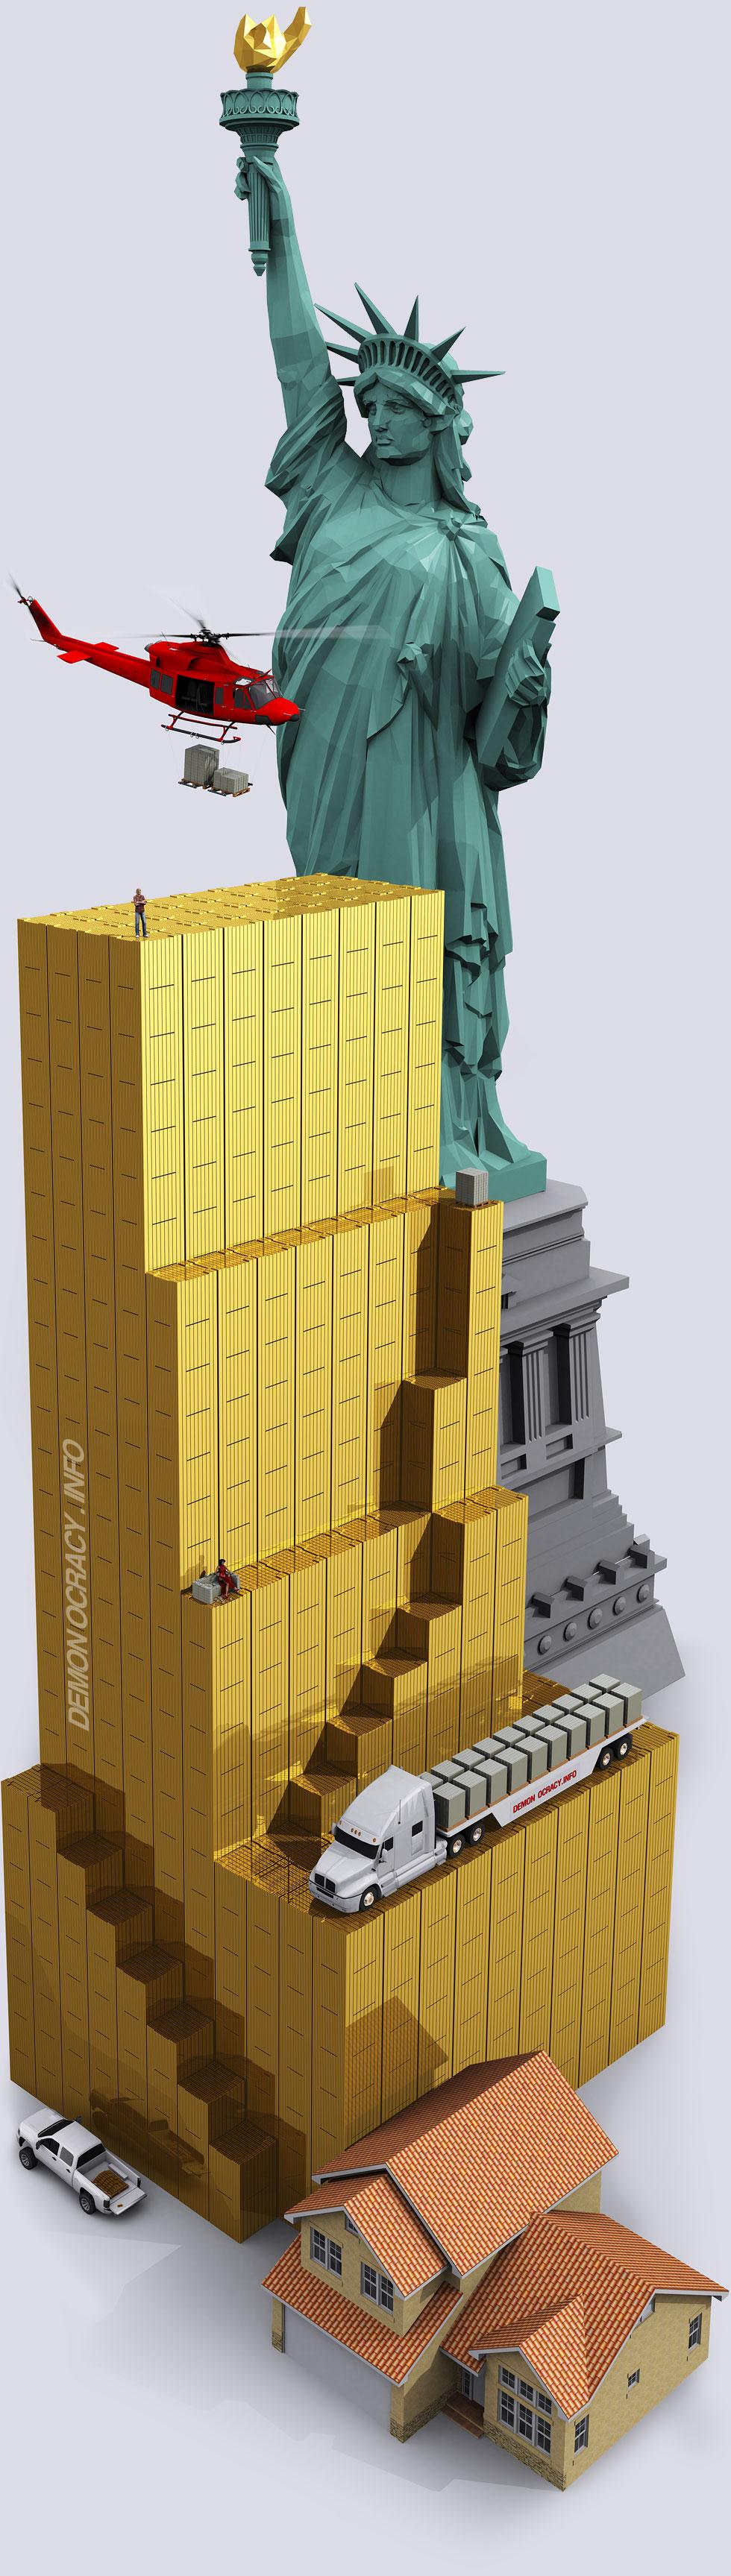 https://i1.wp.com/demonocracy.info/infographics/world/gold/images/demonocracy-gold-all_gold_in_the_world-reserves.jpg